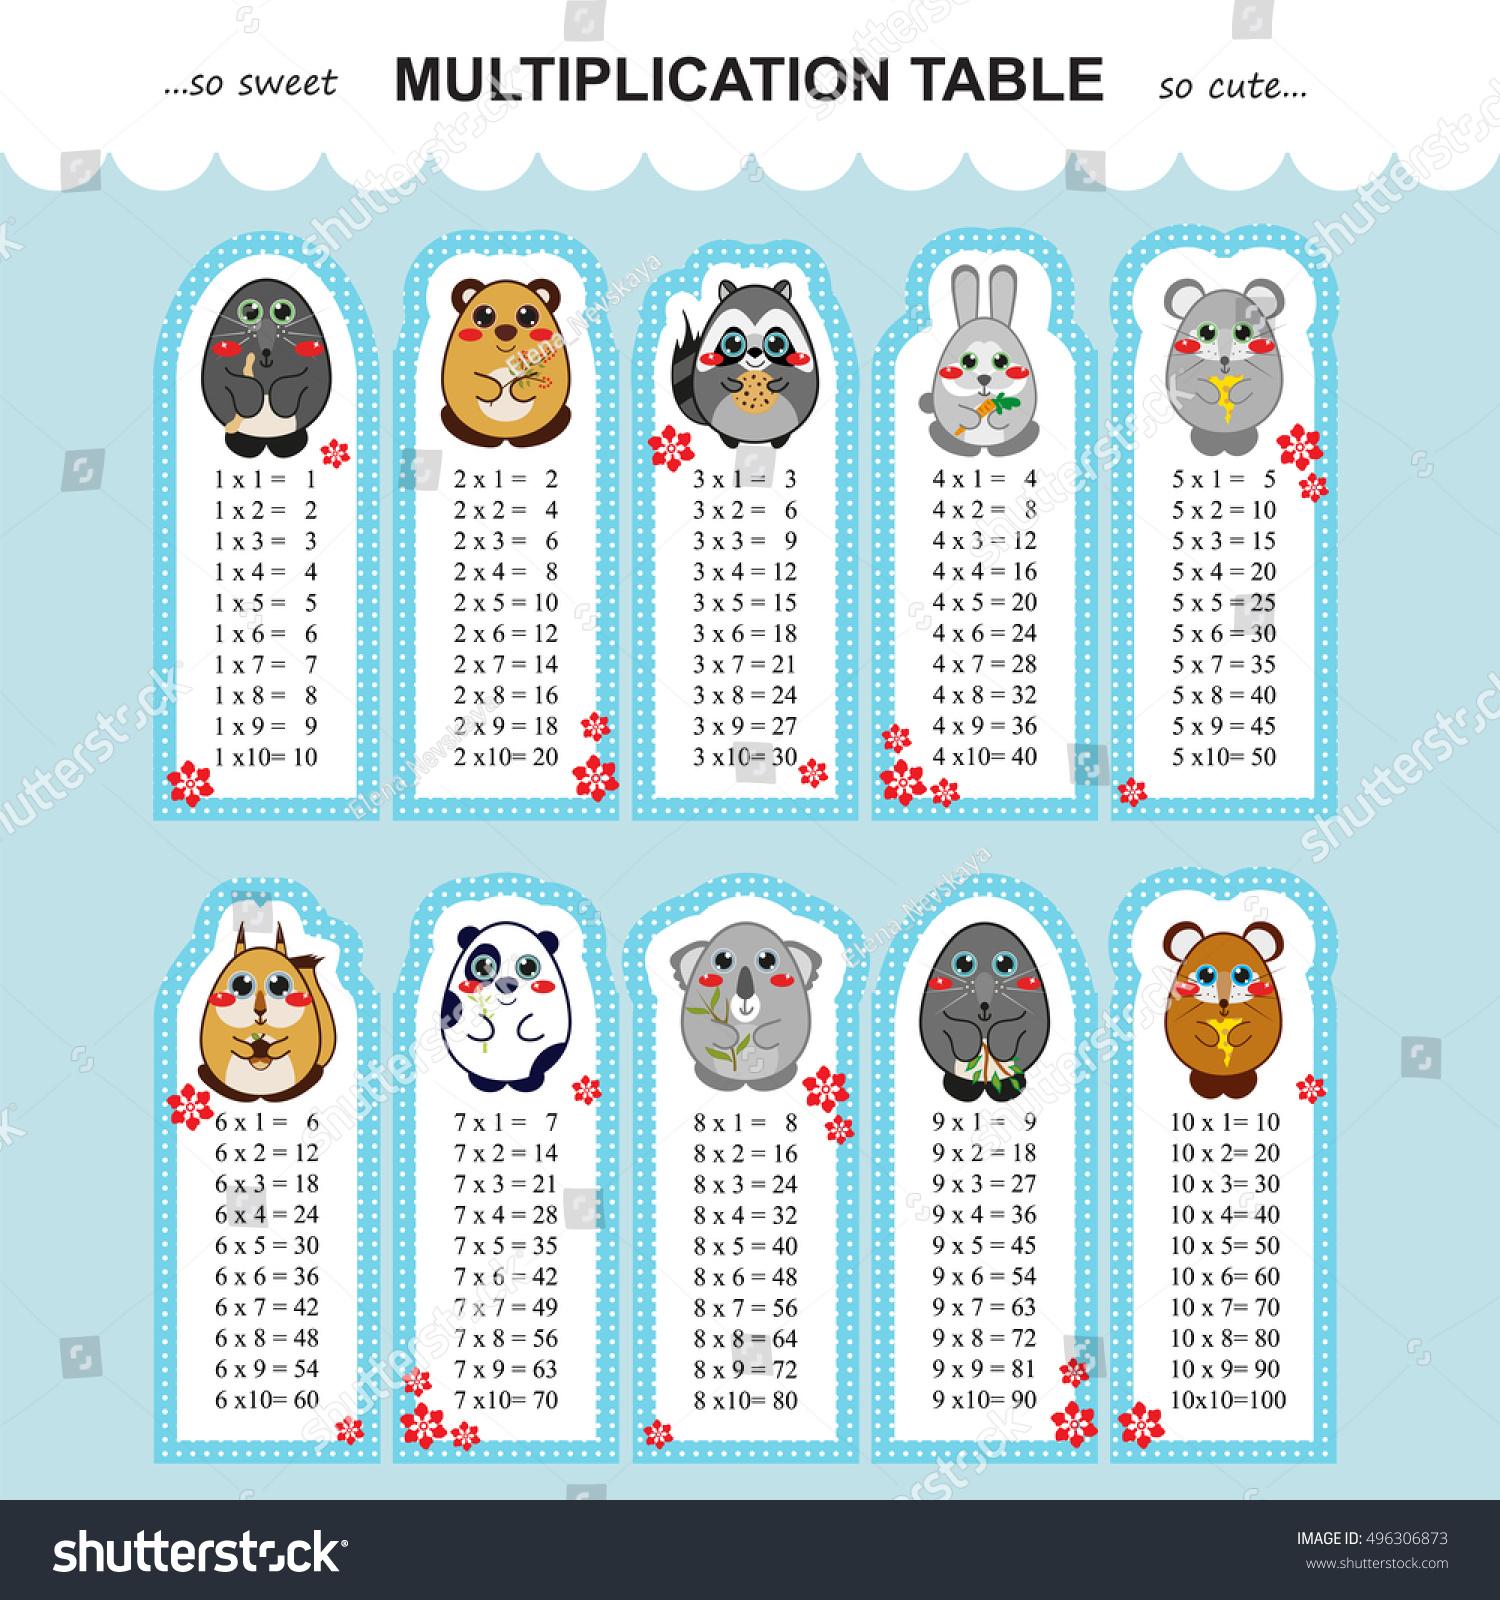 Vector Multiplication Table Printable Bookmarks Stickers for Printable Multiplication Bookmarks